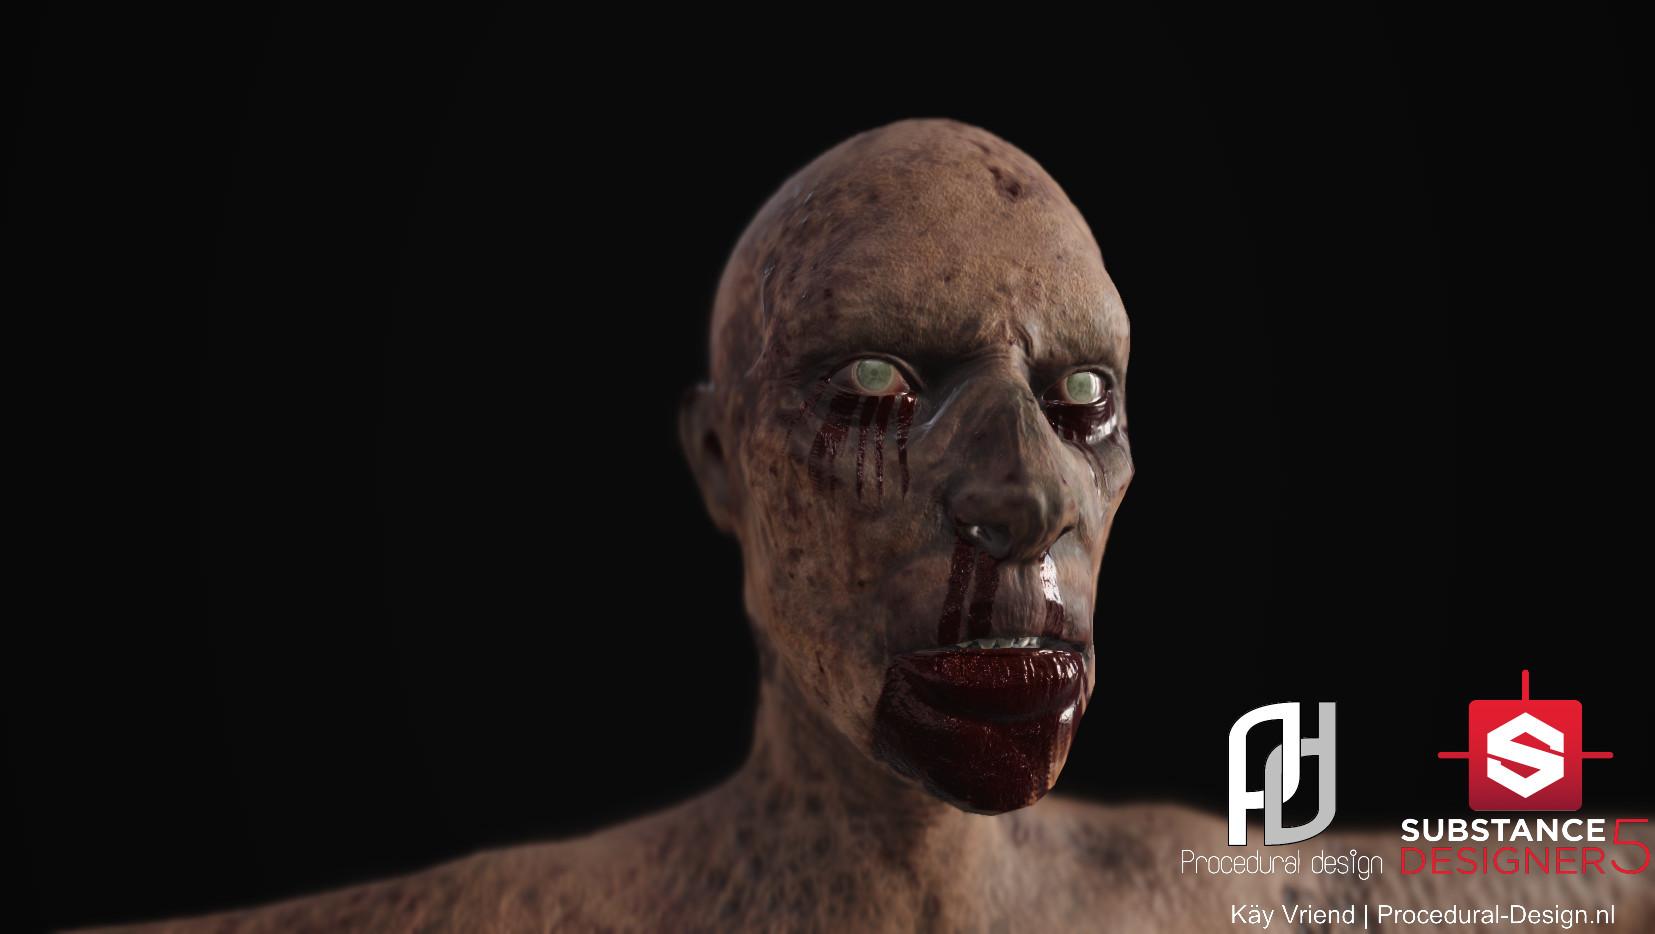 Kay vriend zombie 12